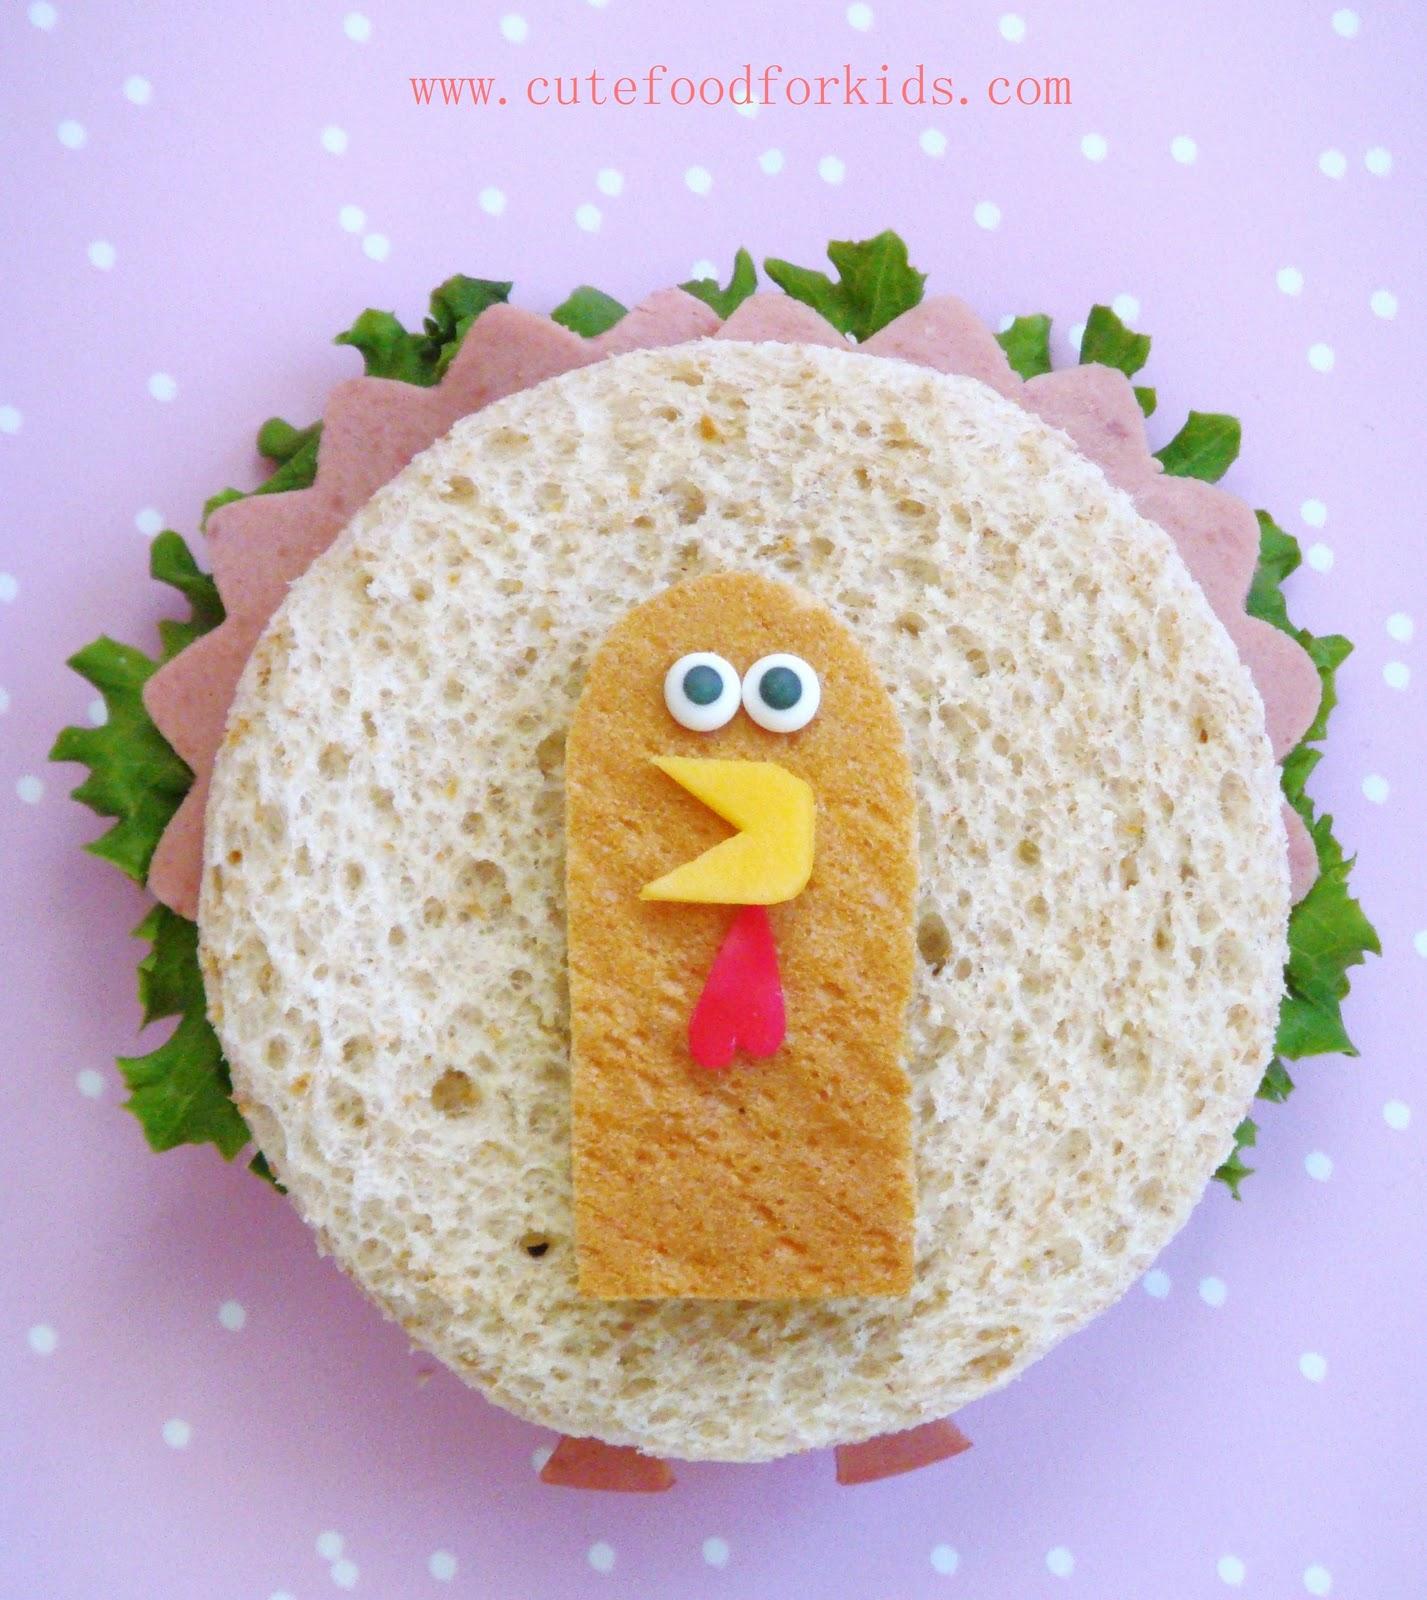 Cute Food For Kids?: A Cute Turkey Sandwich For Thanksgiving